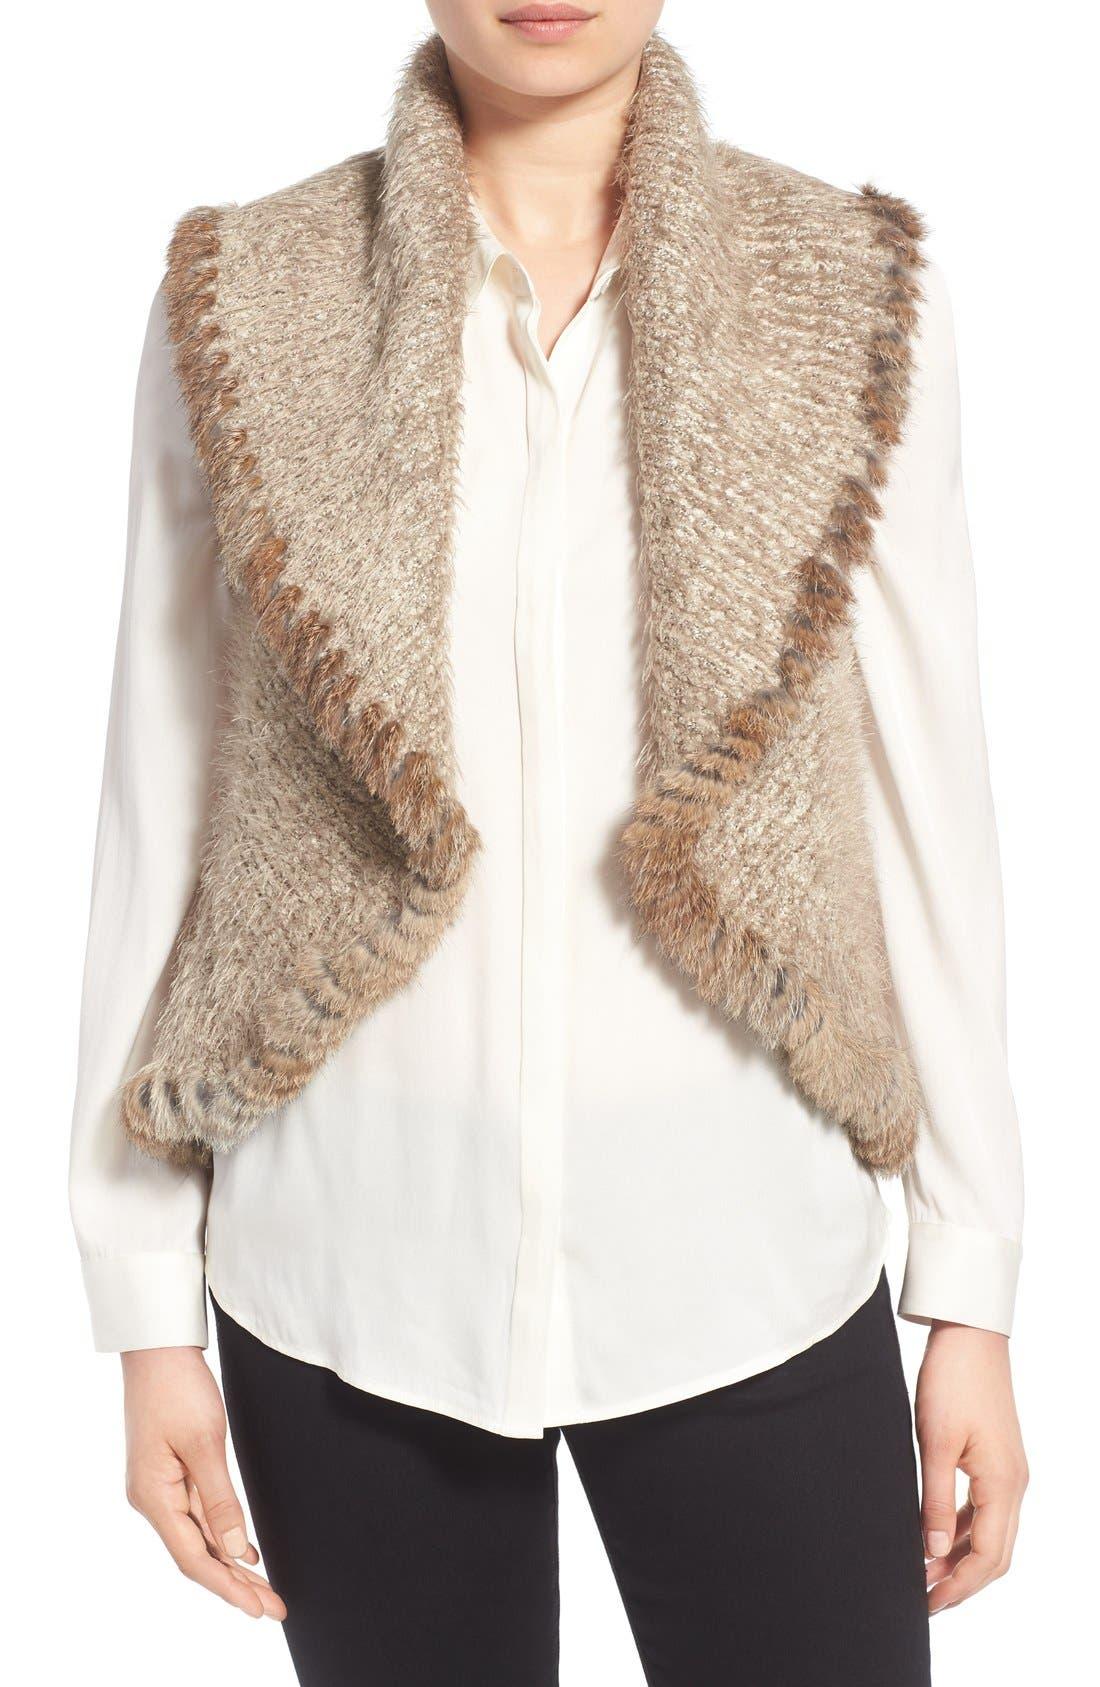 Alternate Image 1 Selected - Love Token Knit Vest with Genuine Rabbit Fur Trim